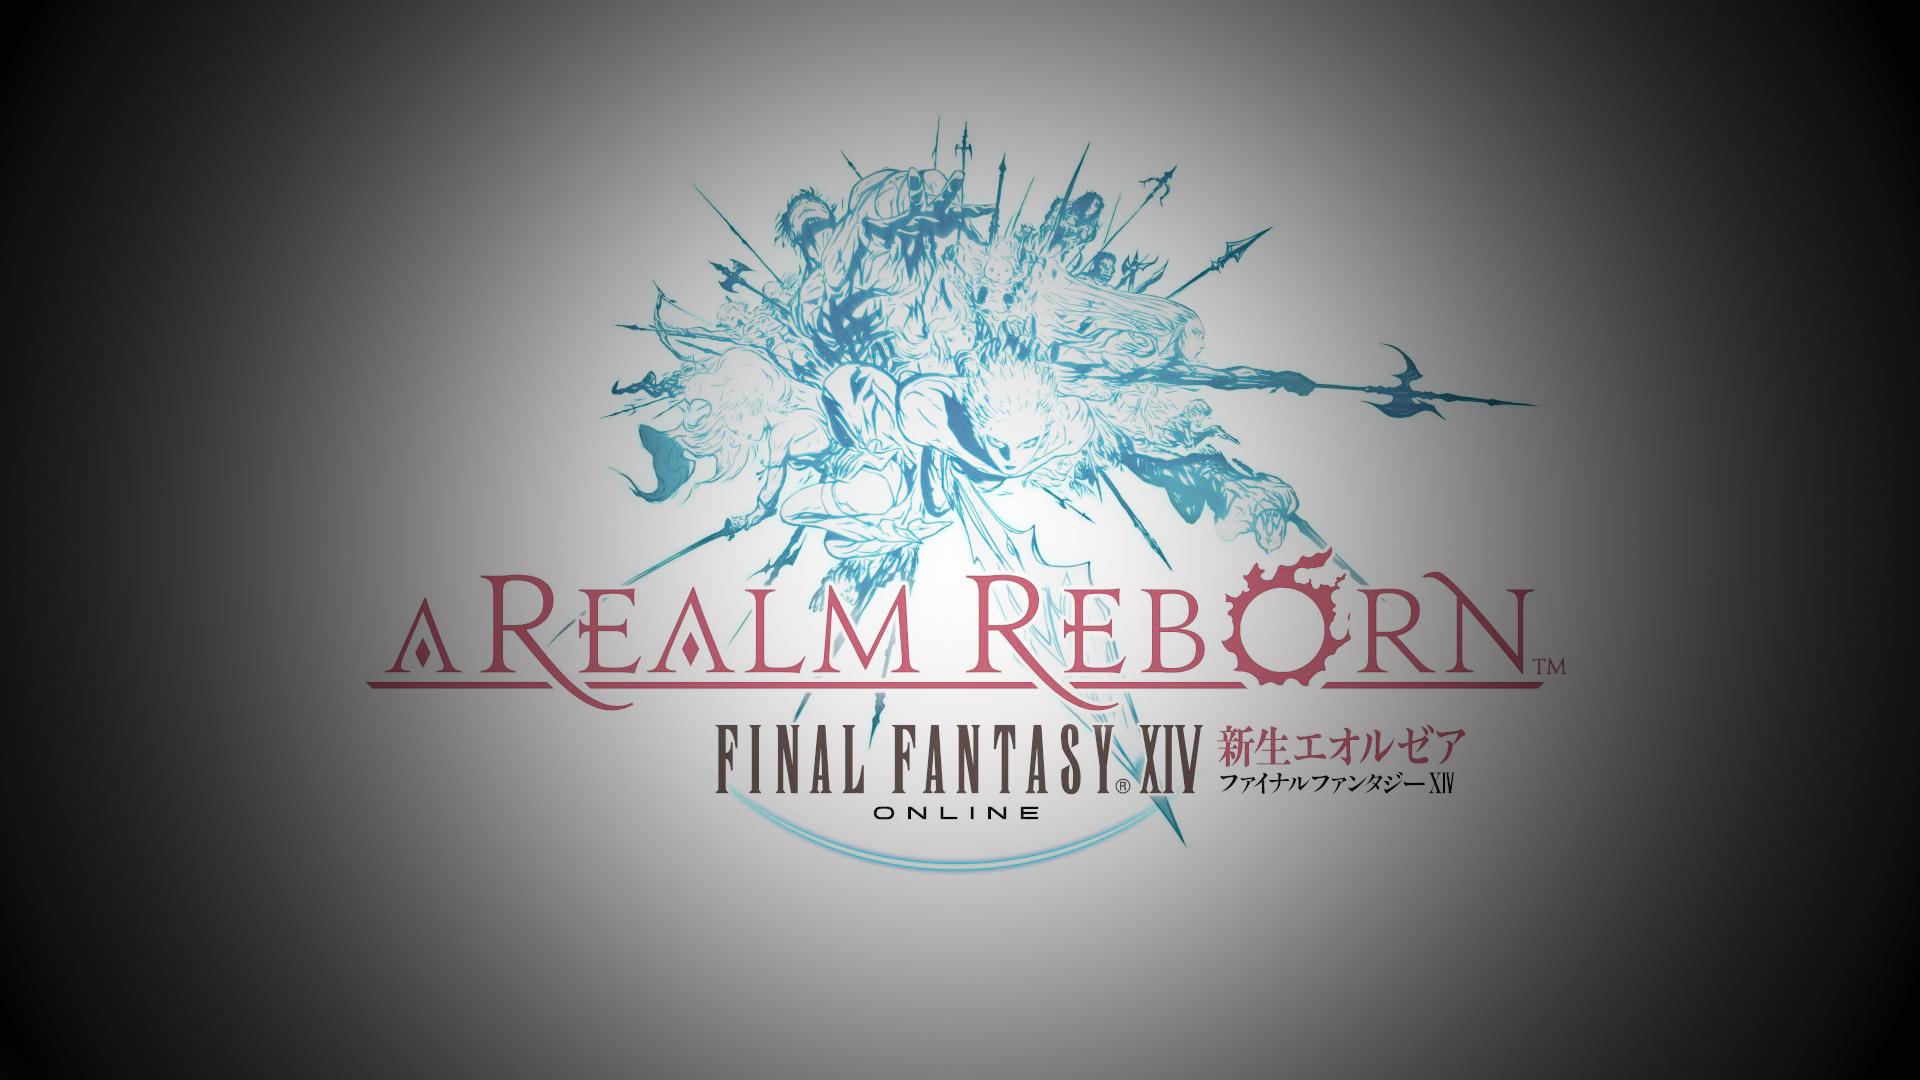 Final Fantasy A Realm Reborn Wallpaper 3 By Alboquest On Deviantart